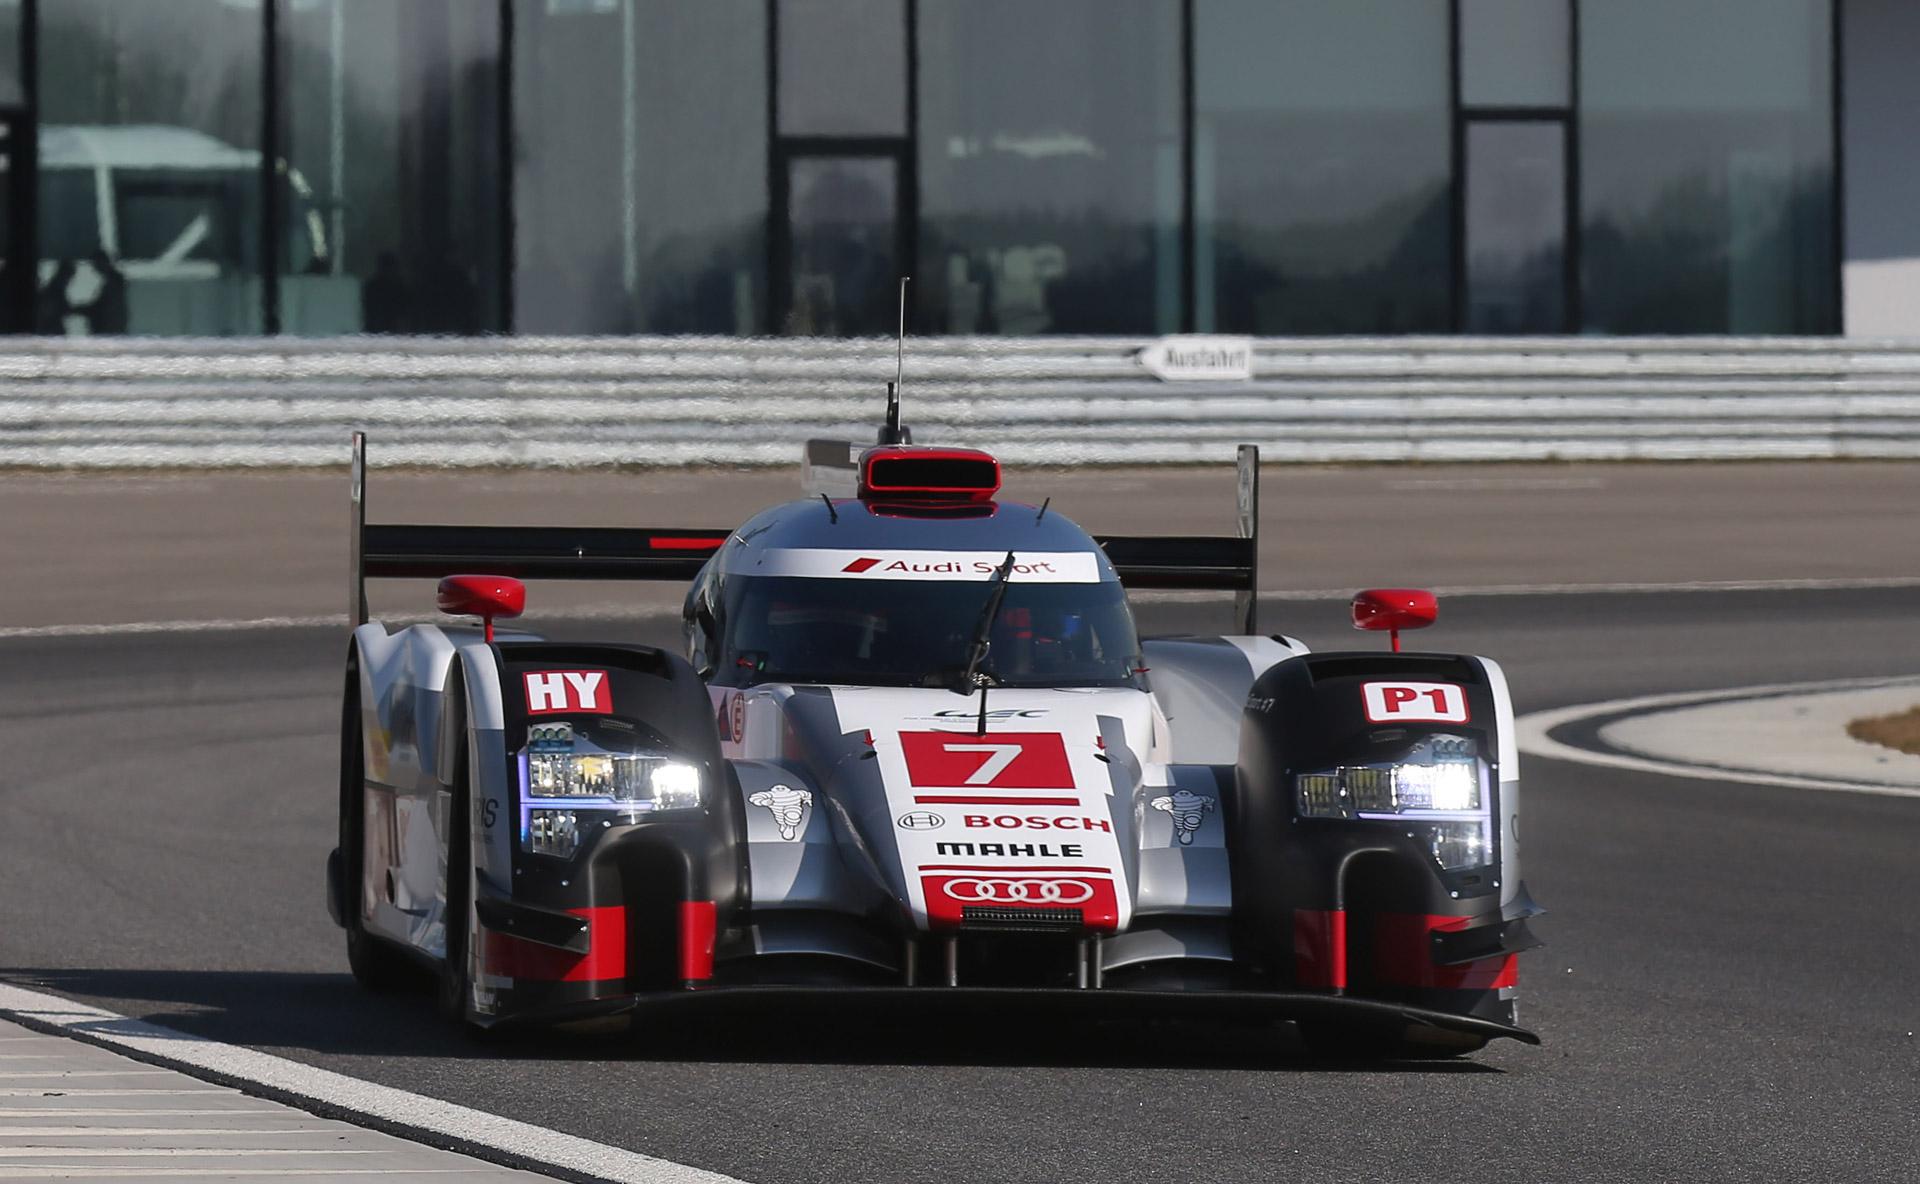 Luxury Audi Cars Hd Wallpaper First Look At 2015 Audi R18 E Tron Quattro Le Mans Prototype